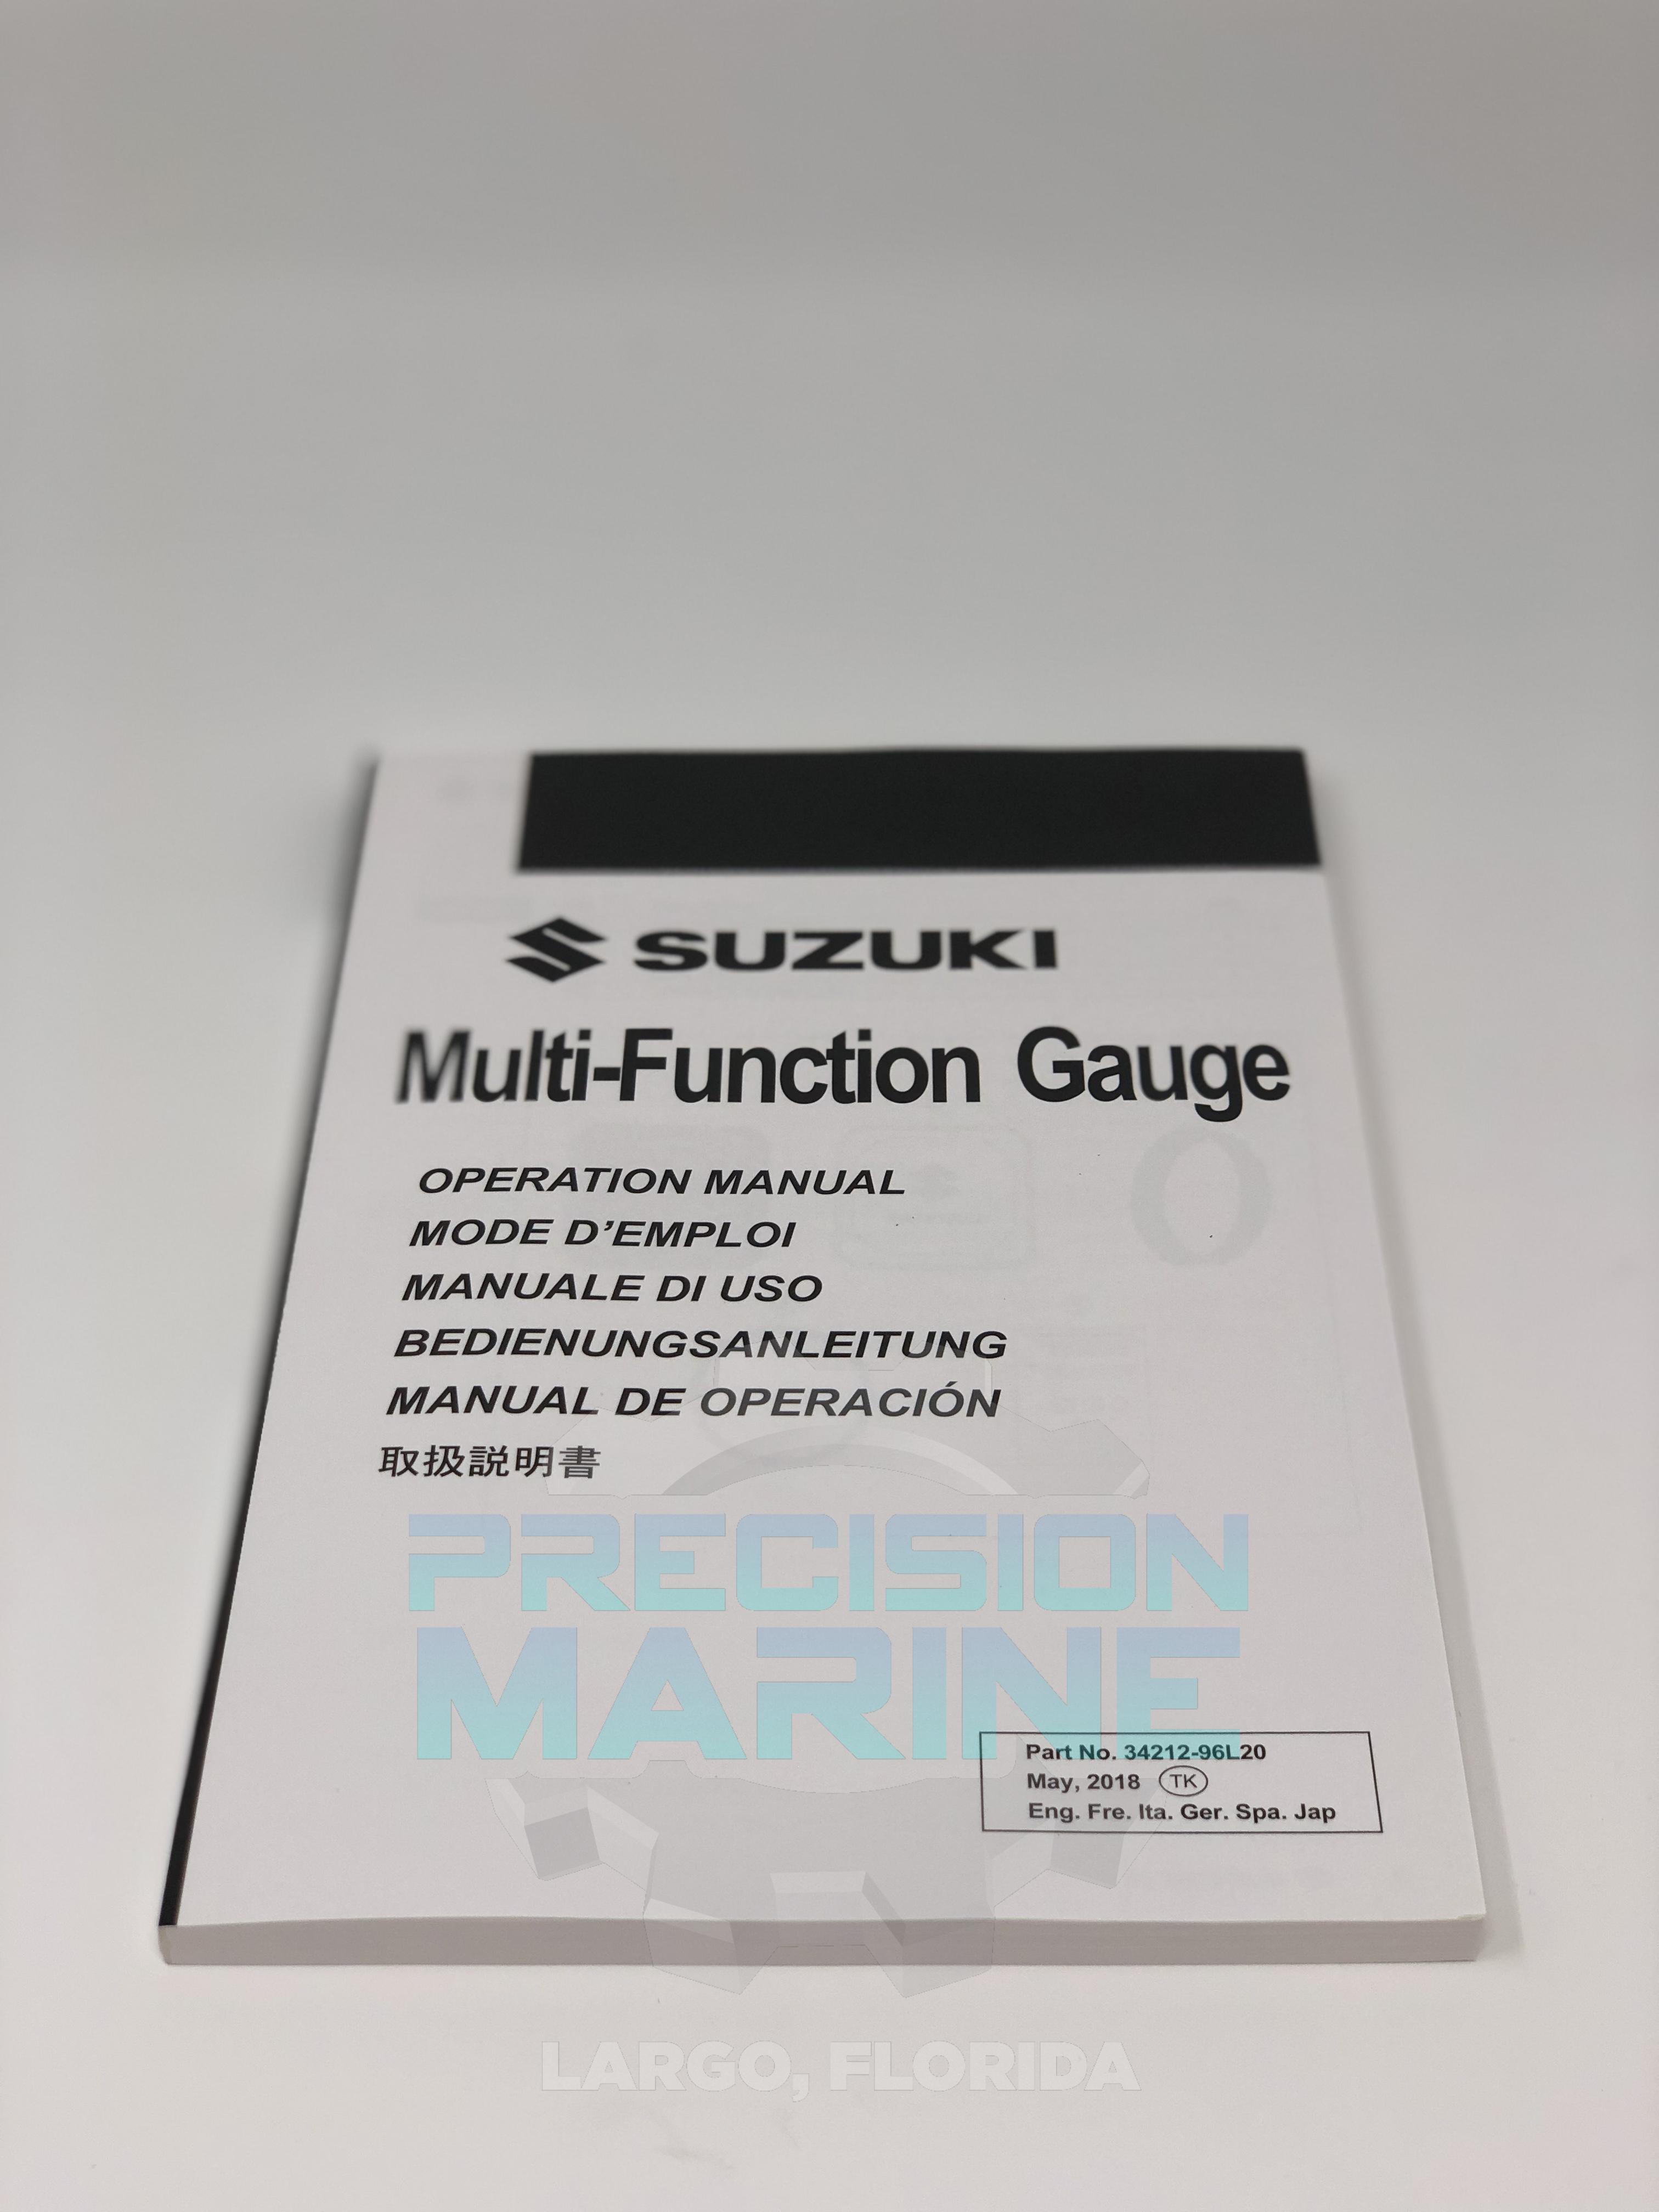 Suzuki Tachometer Wiring from static-cdn.imageservice.cloud